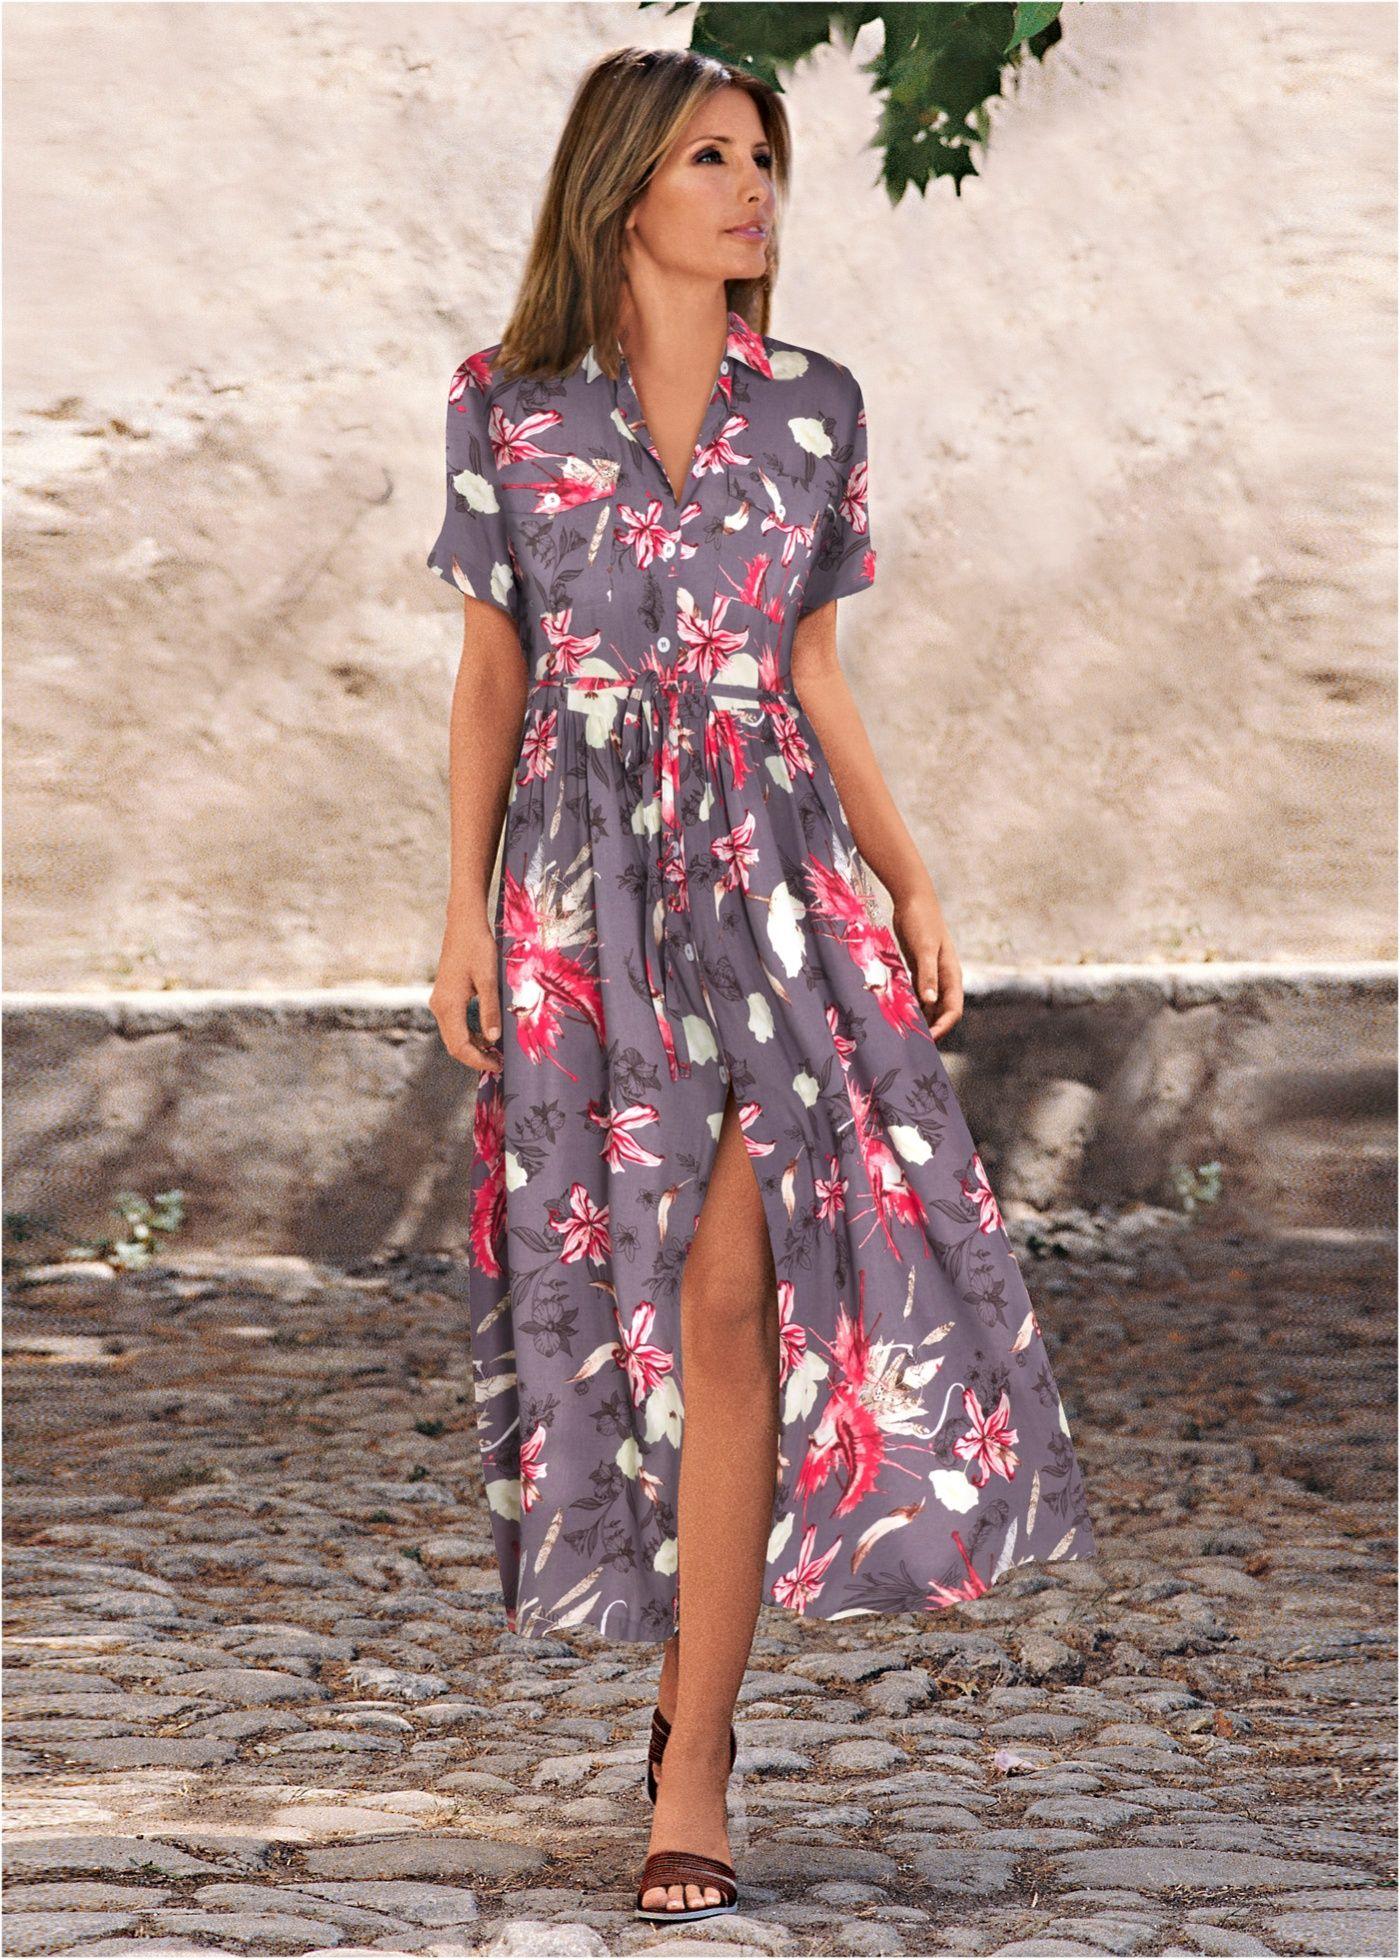 9d0e4da56 Vestido chemise longo oliva-escuro estampado encomendar agora na loja  on-line bonprix.